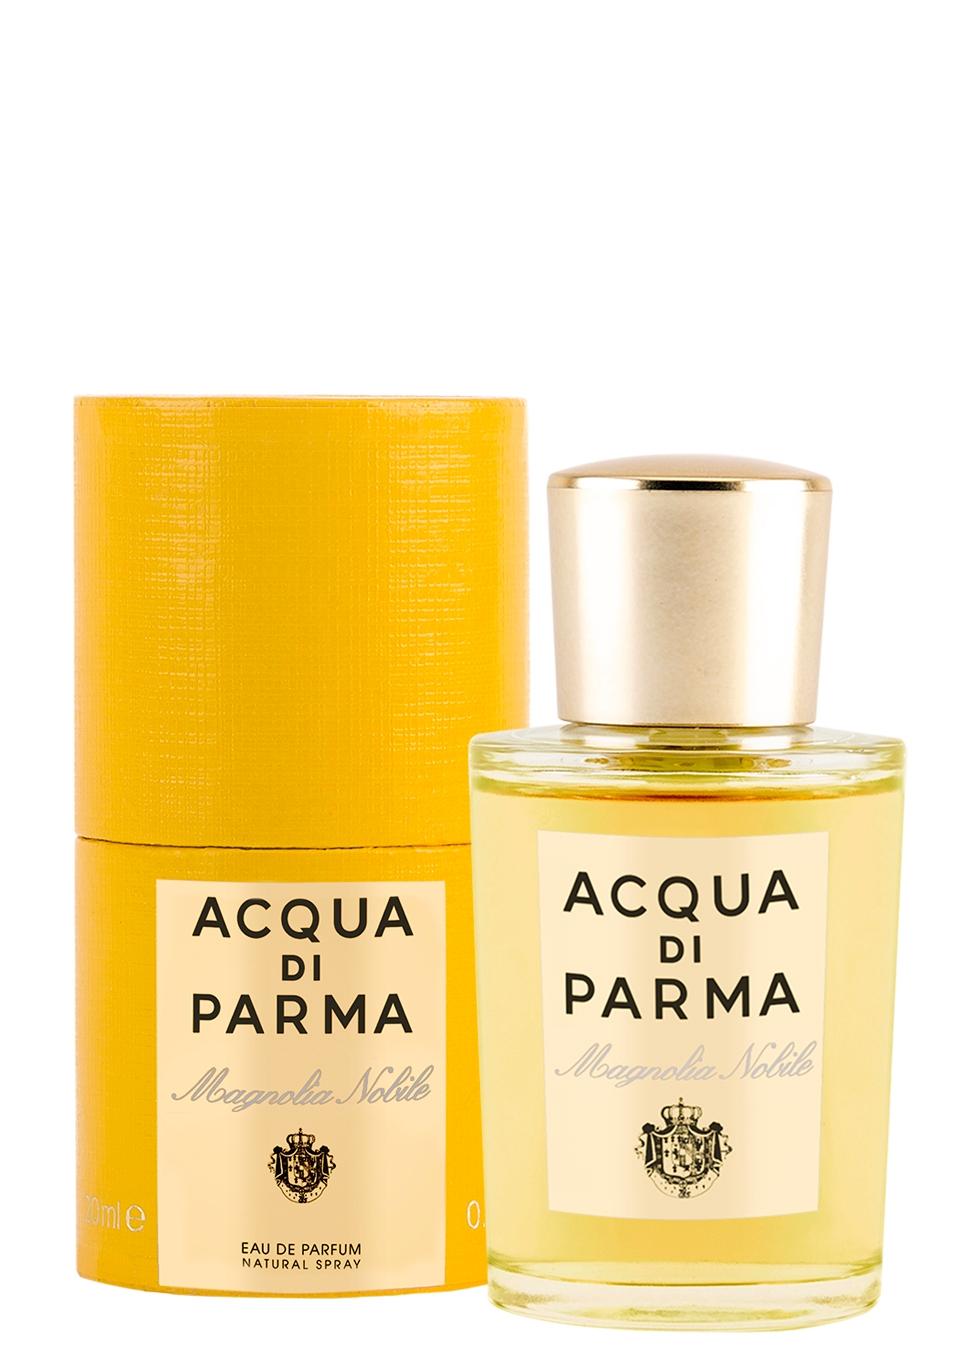 Magnolia Nobile Eau De Parfum 20ml - Acqua di Parma